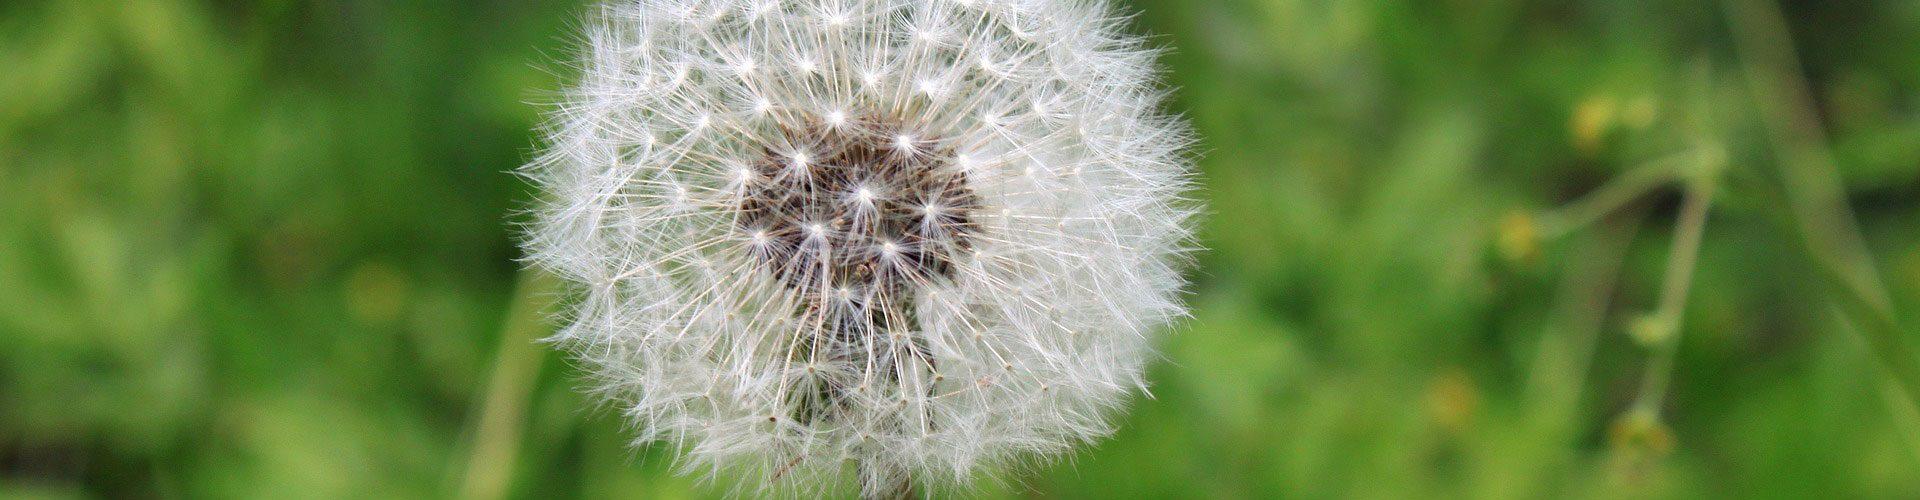 Are You Prepared for Allergy Season?